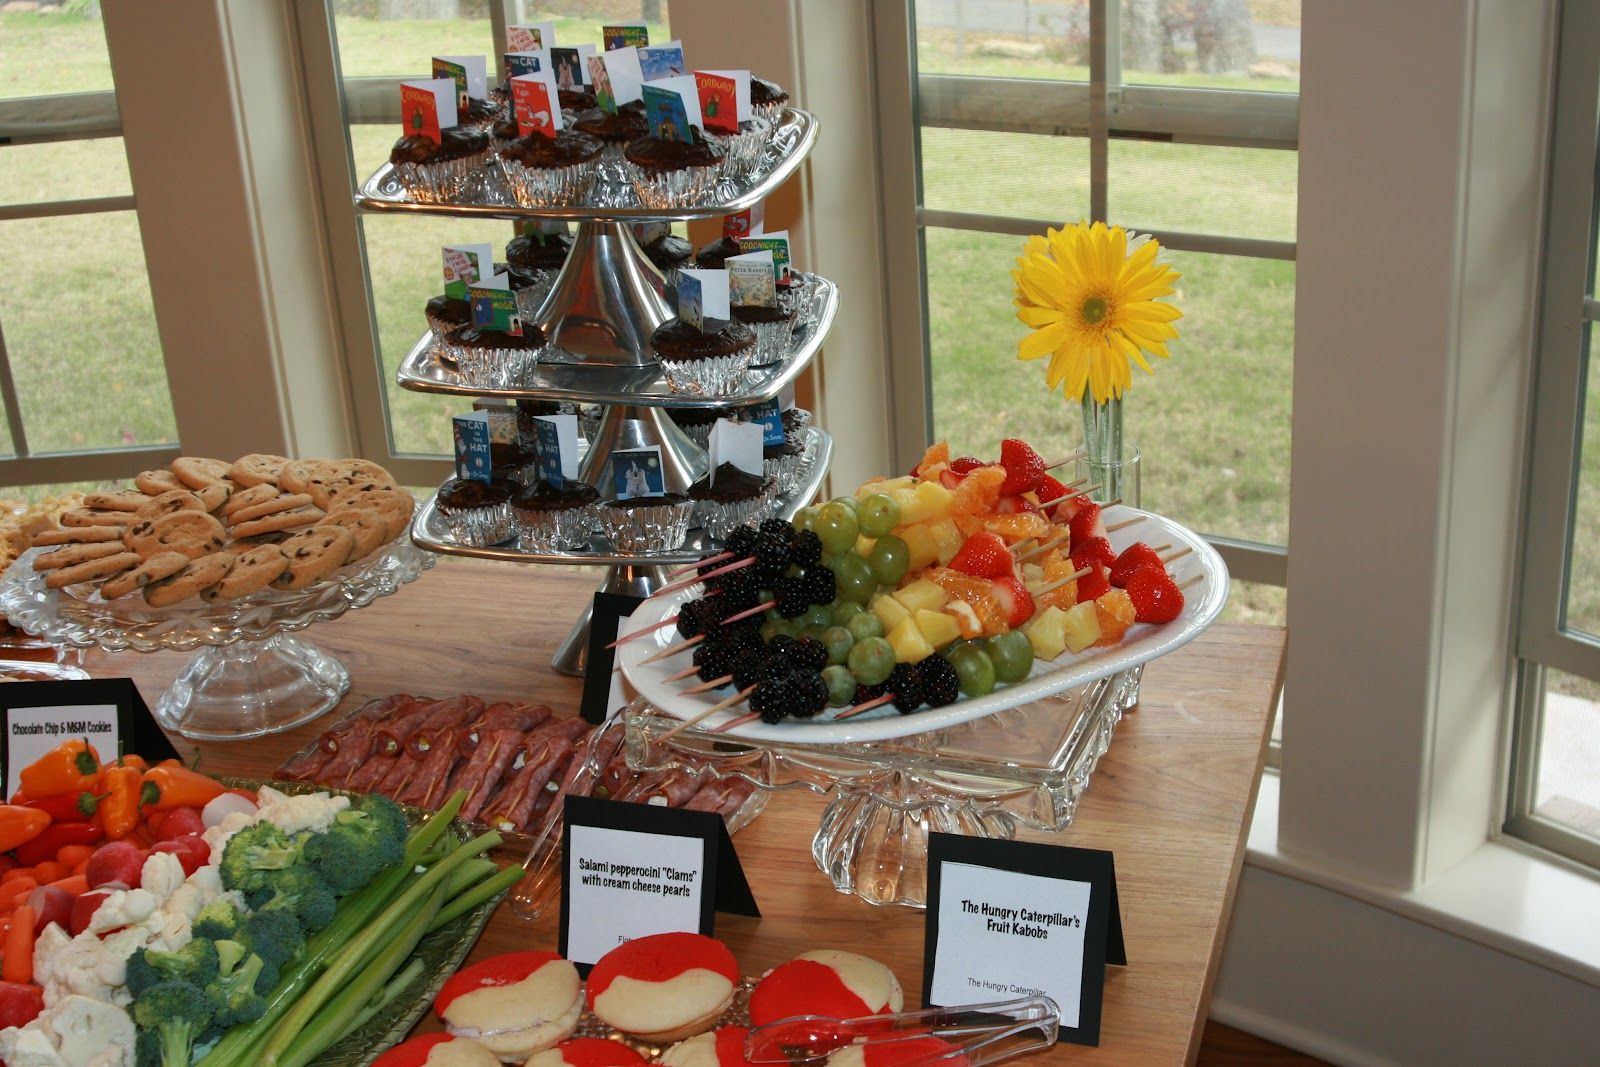 Baby Shower Food Ideas: Baby Shower Food Ideas For Winter